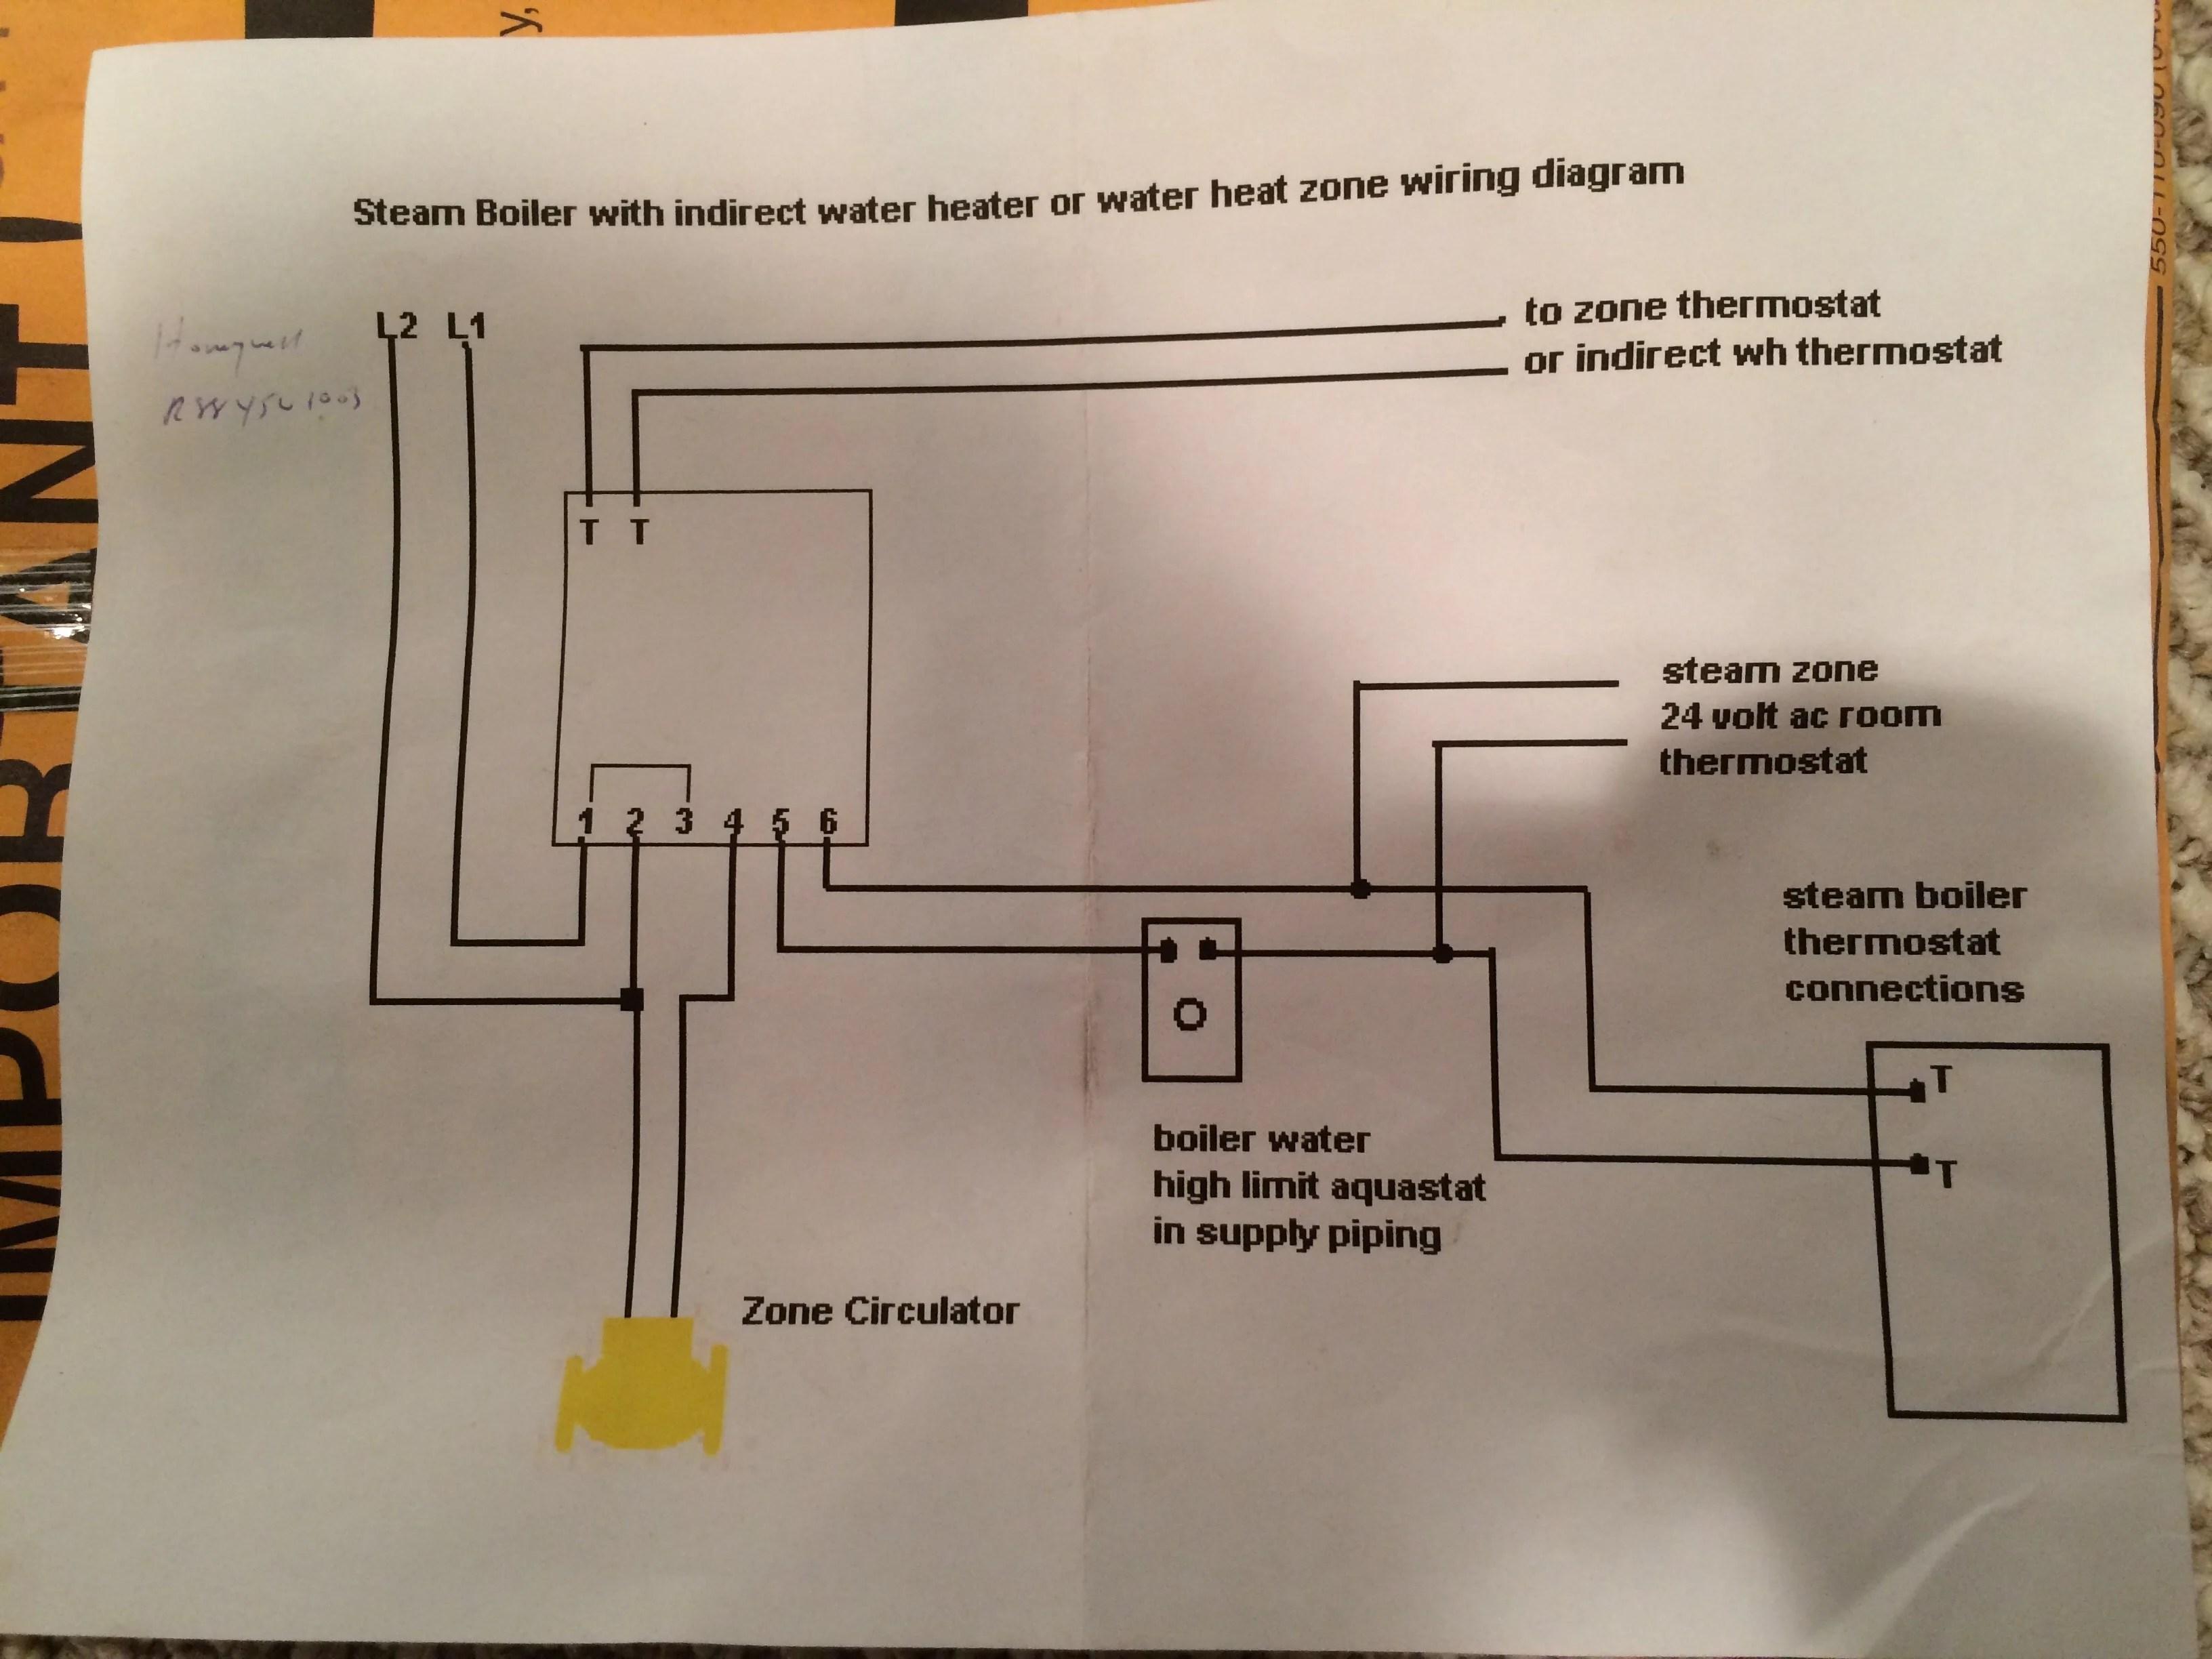 steam boiler wiring diagram 1997 ford ranger radio weil mclain harness raypak